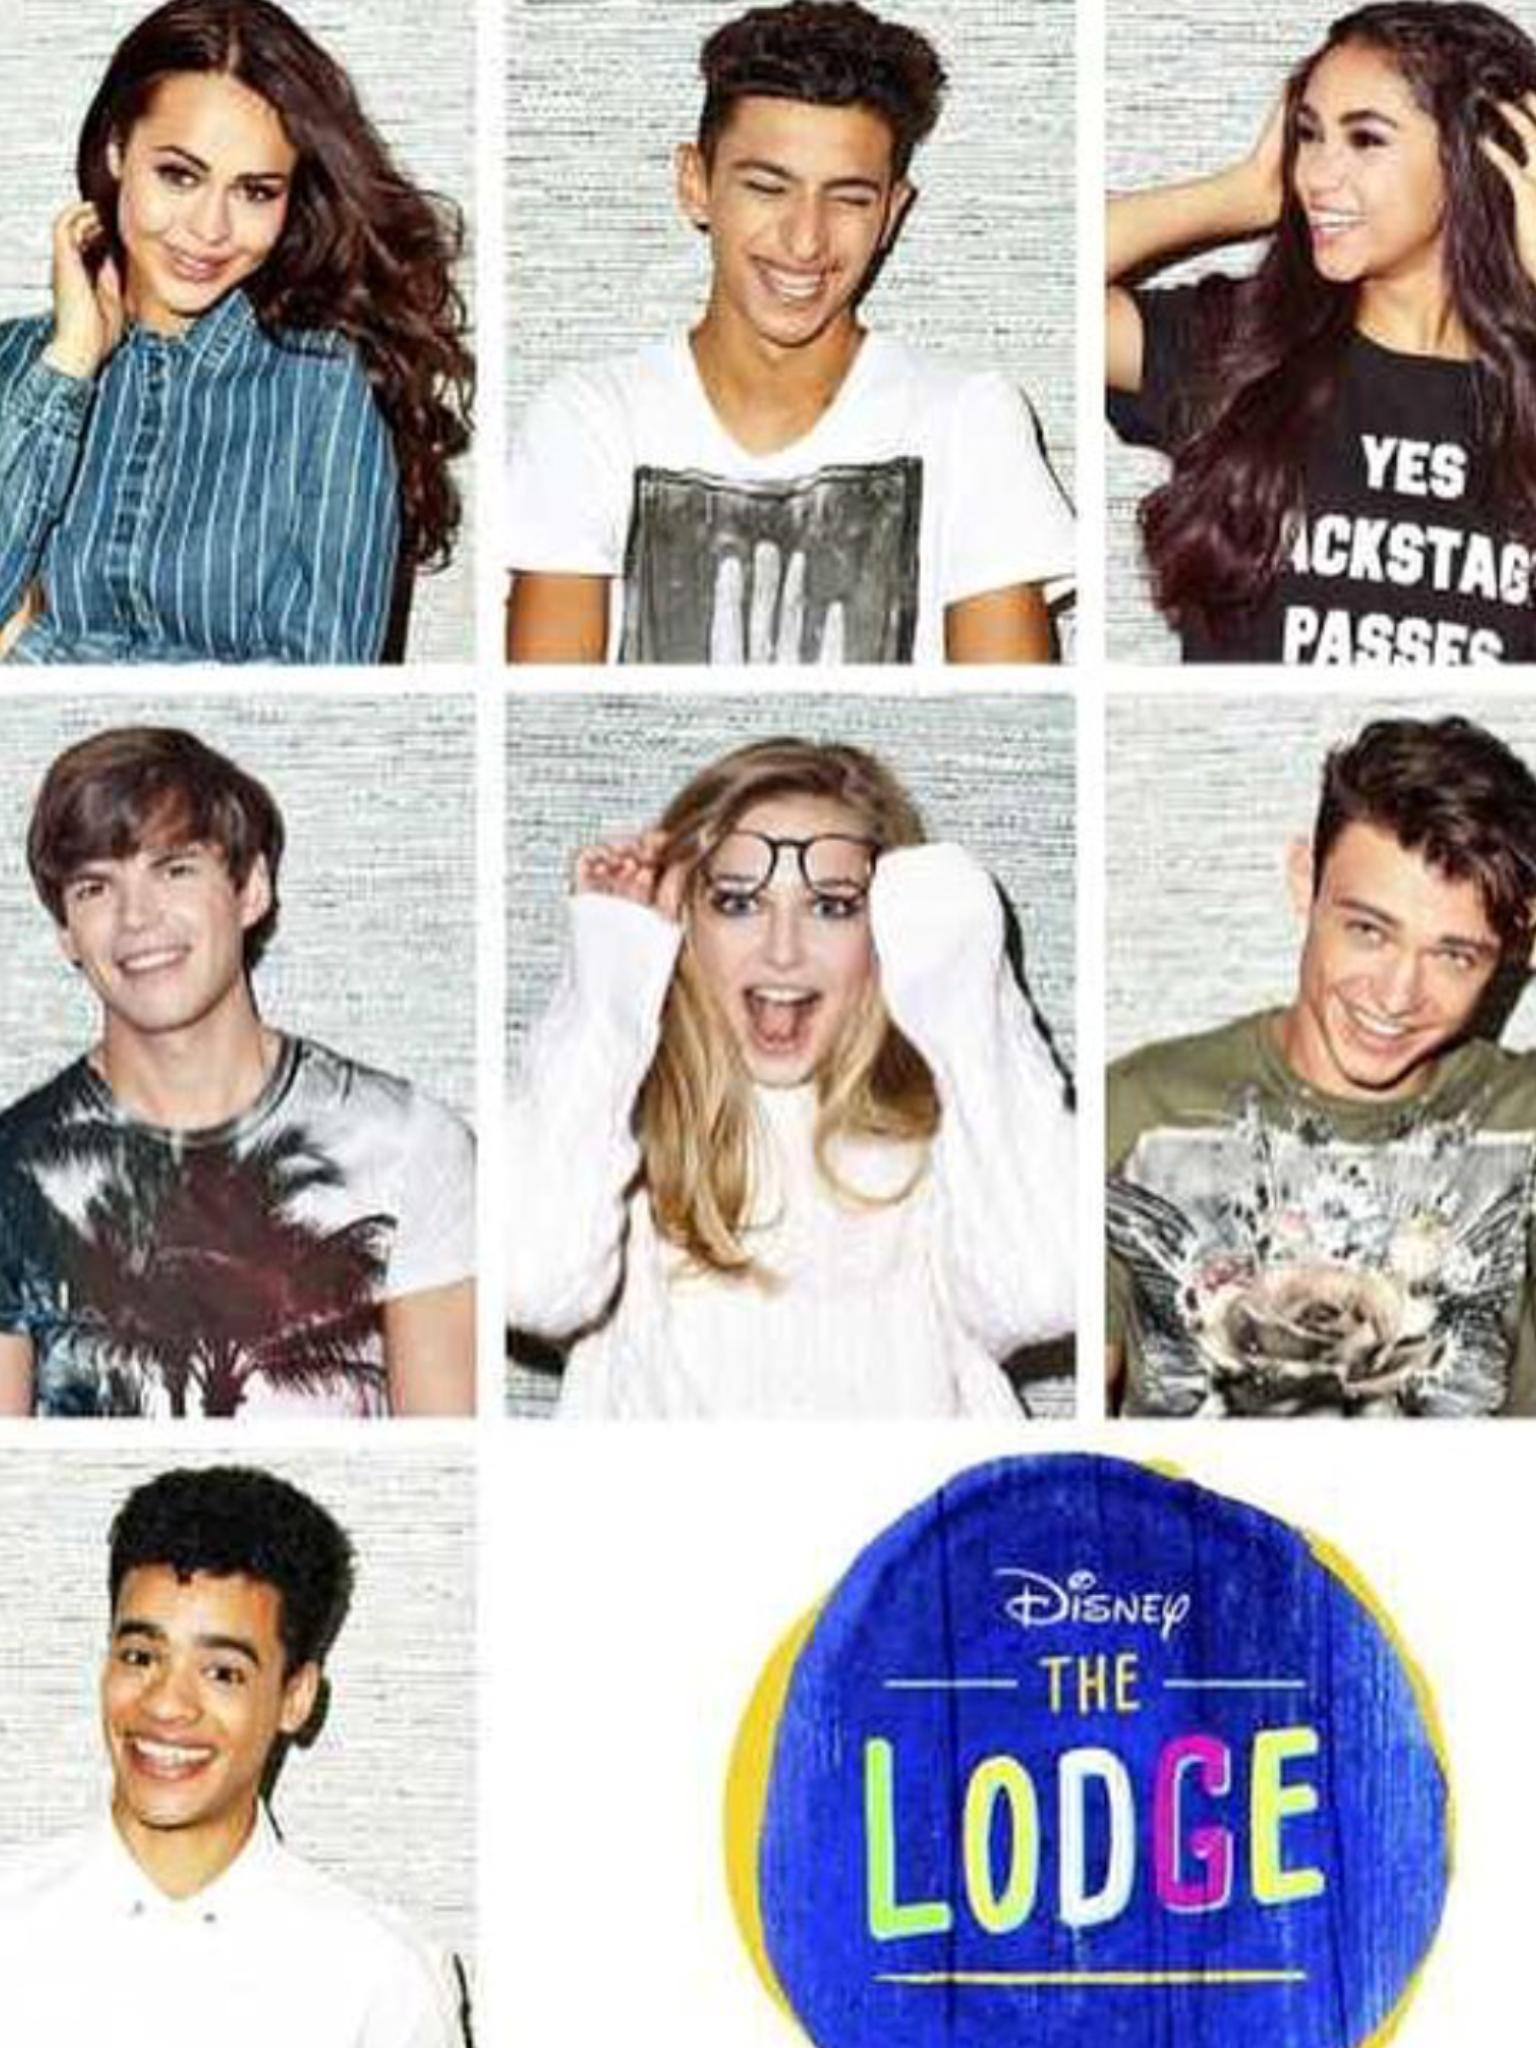 Disney The Lodge Cast! Celebrities Pinterest